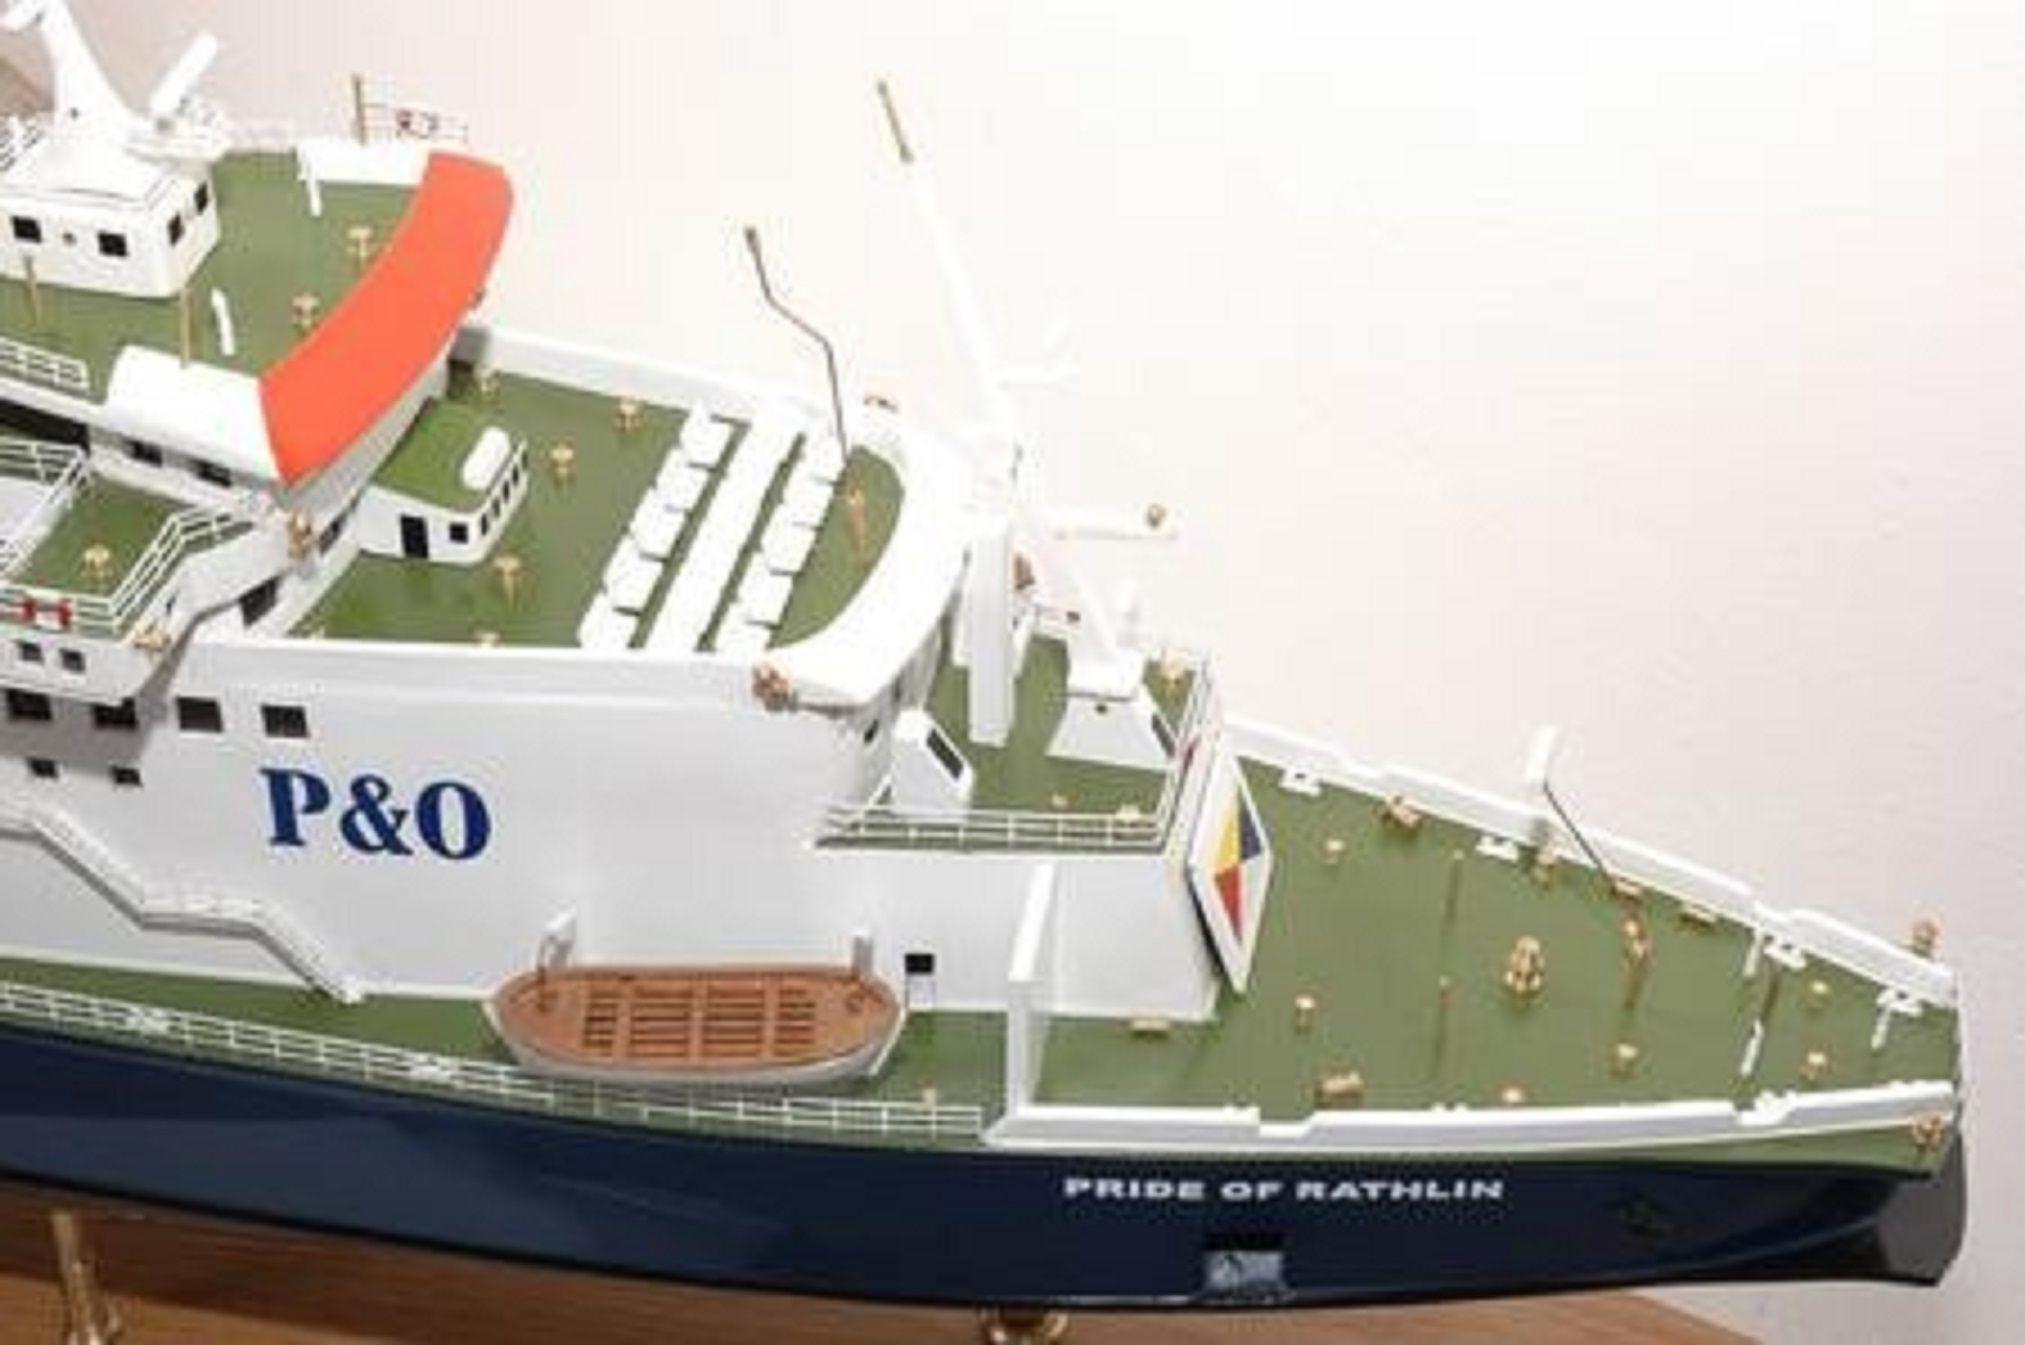 293-7552-P-O-model-ships-Pride-Aisla-and-Rathlin-Premier-Range